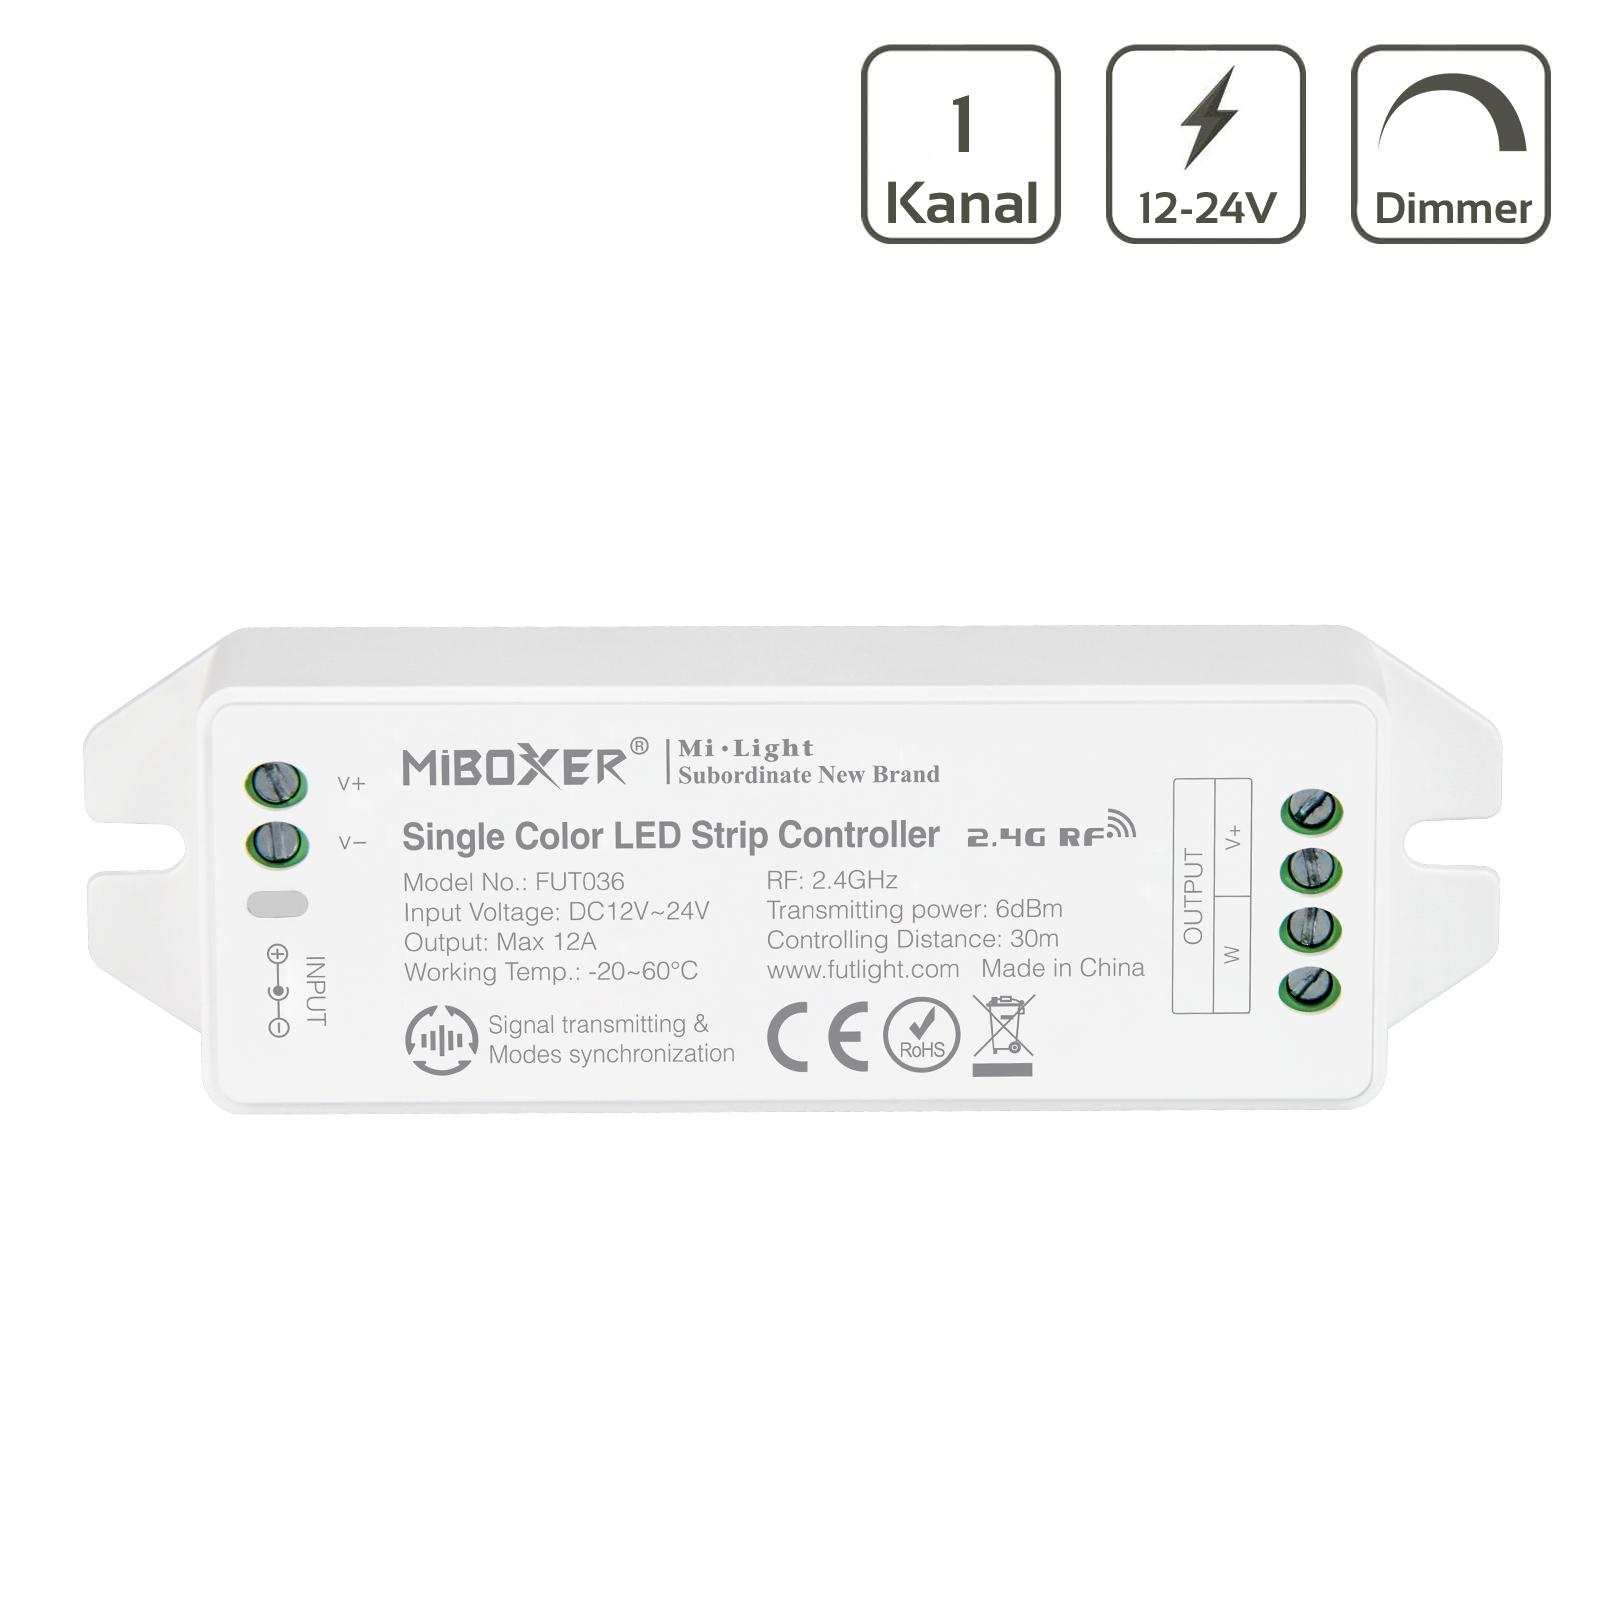 MiBoxer LED Dimmer 1 Kanal 12/24V LED Strip Panel Steuerung FUT036M